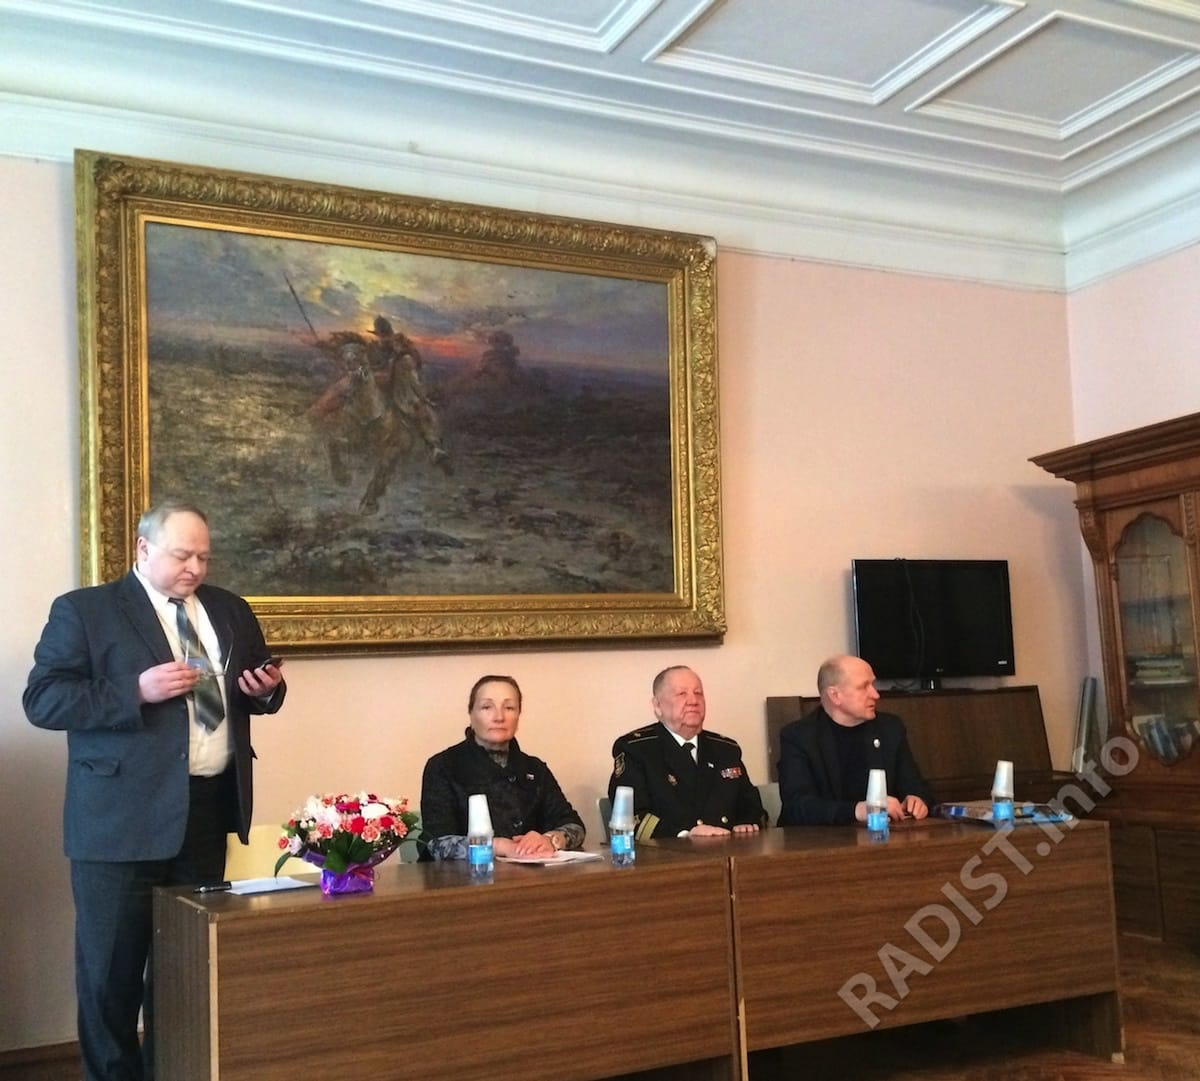 Президиум юбилейных научных чтений (слева направо): А.И. Левченко, Н.Ф. Чашина, А.В. Спешилов, А.П. Тарапон